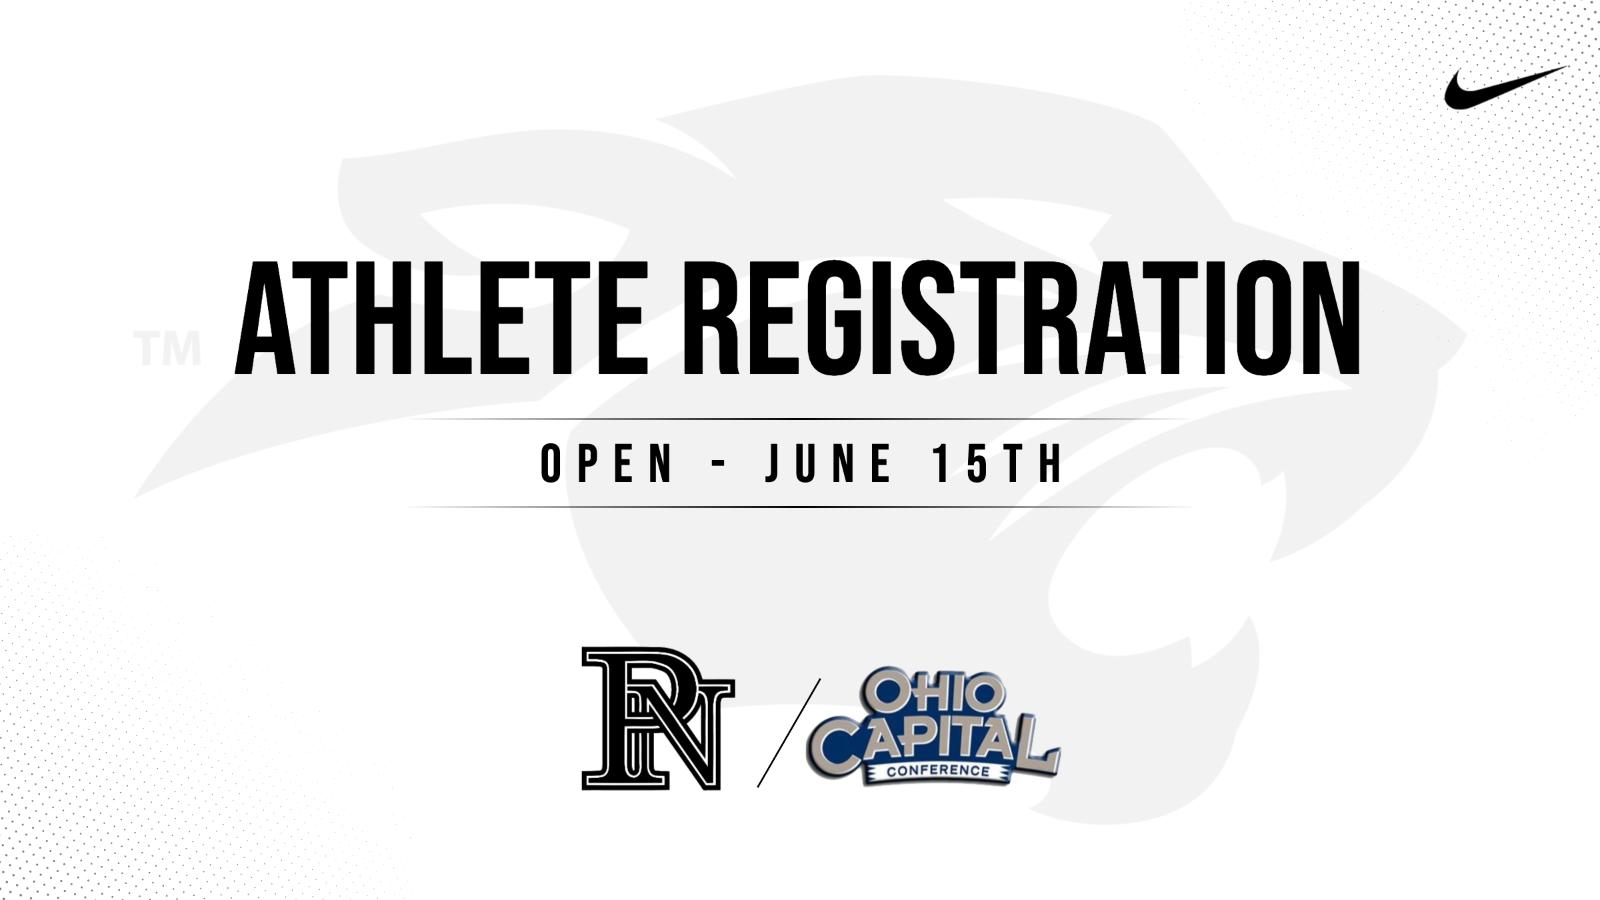 Athlete Registration is Open